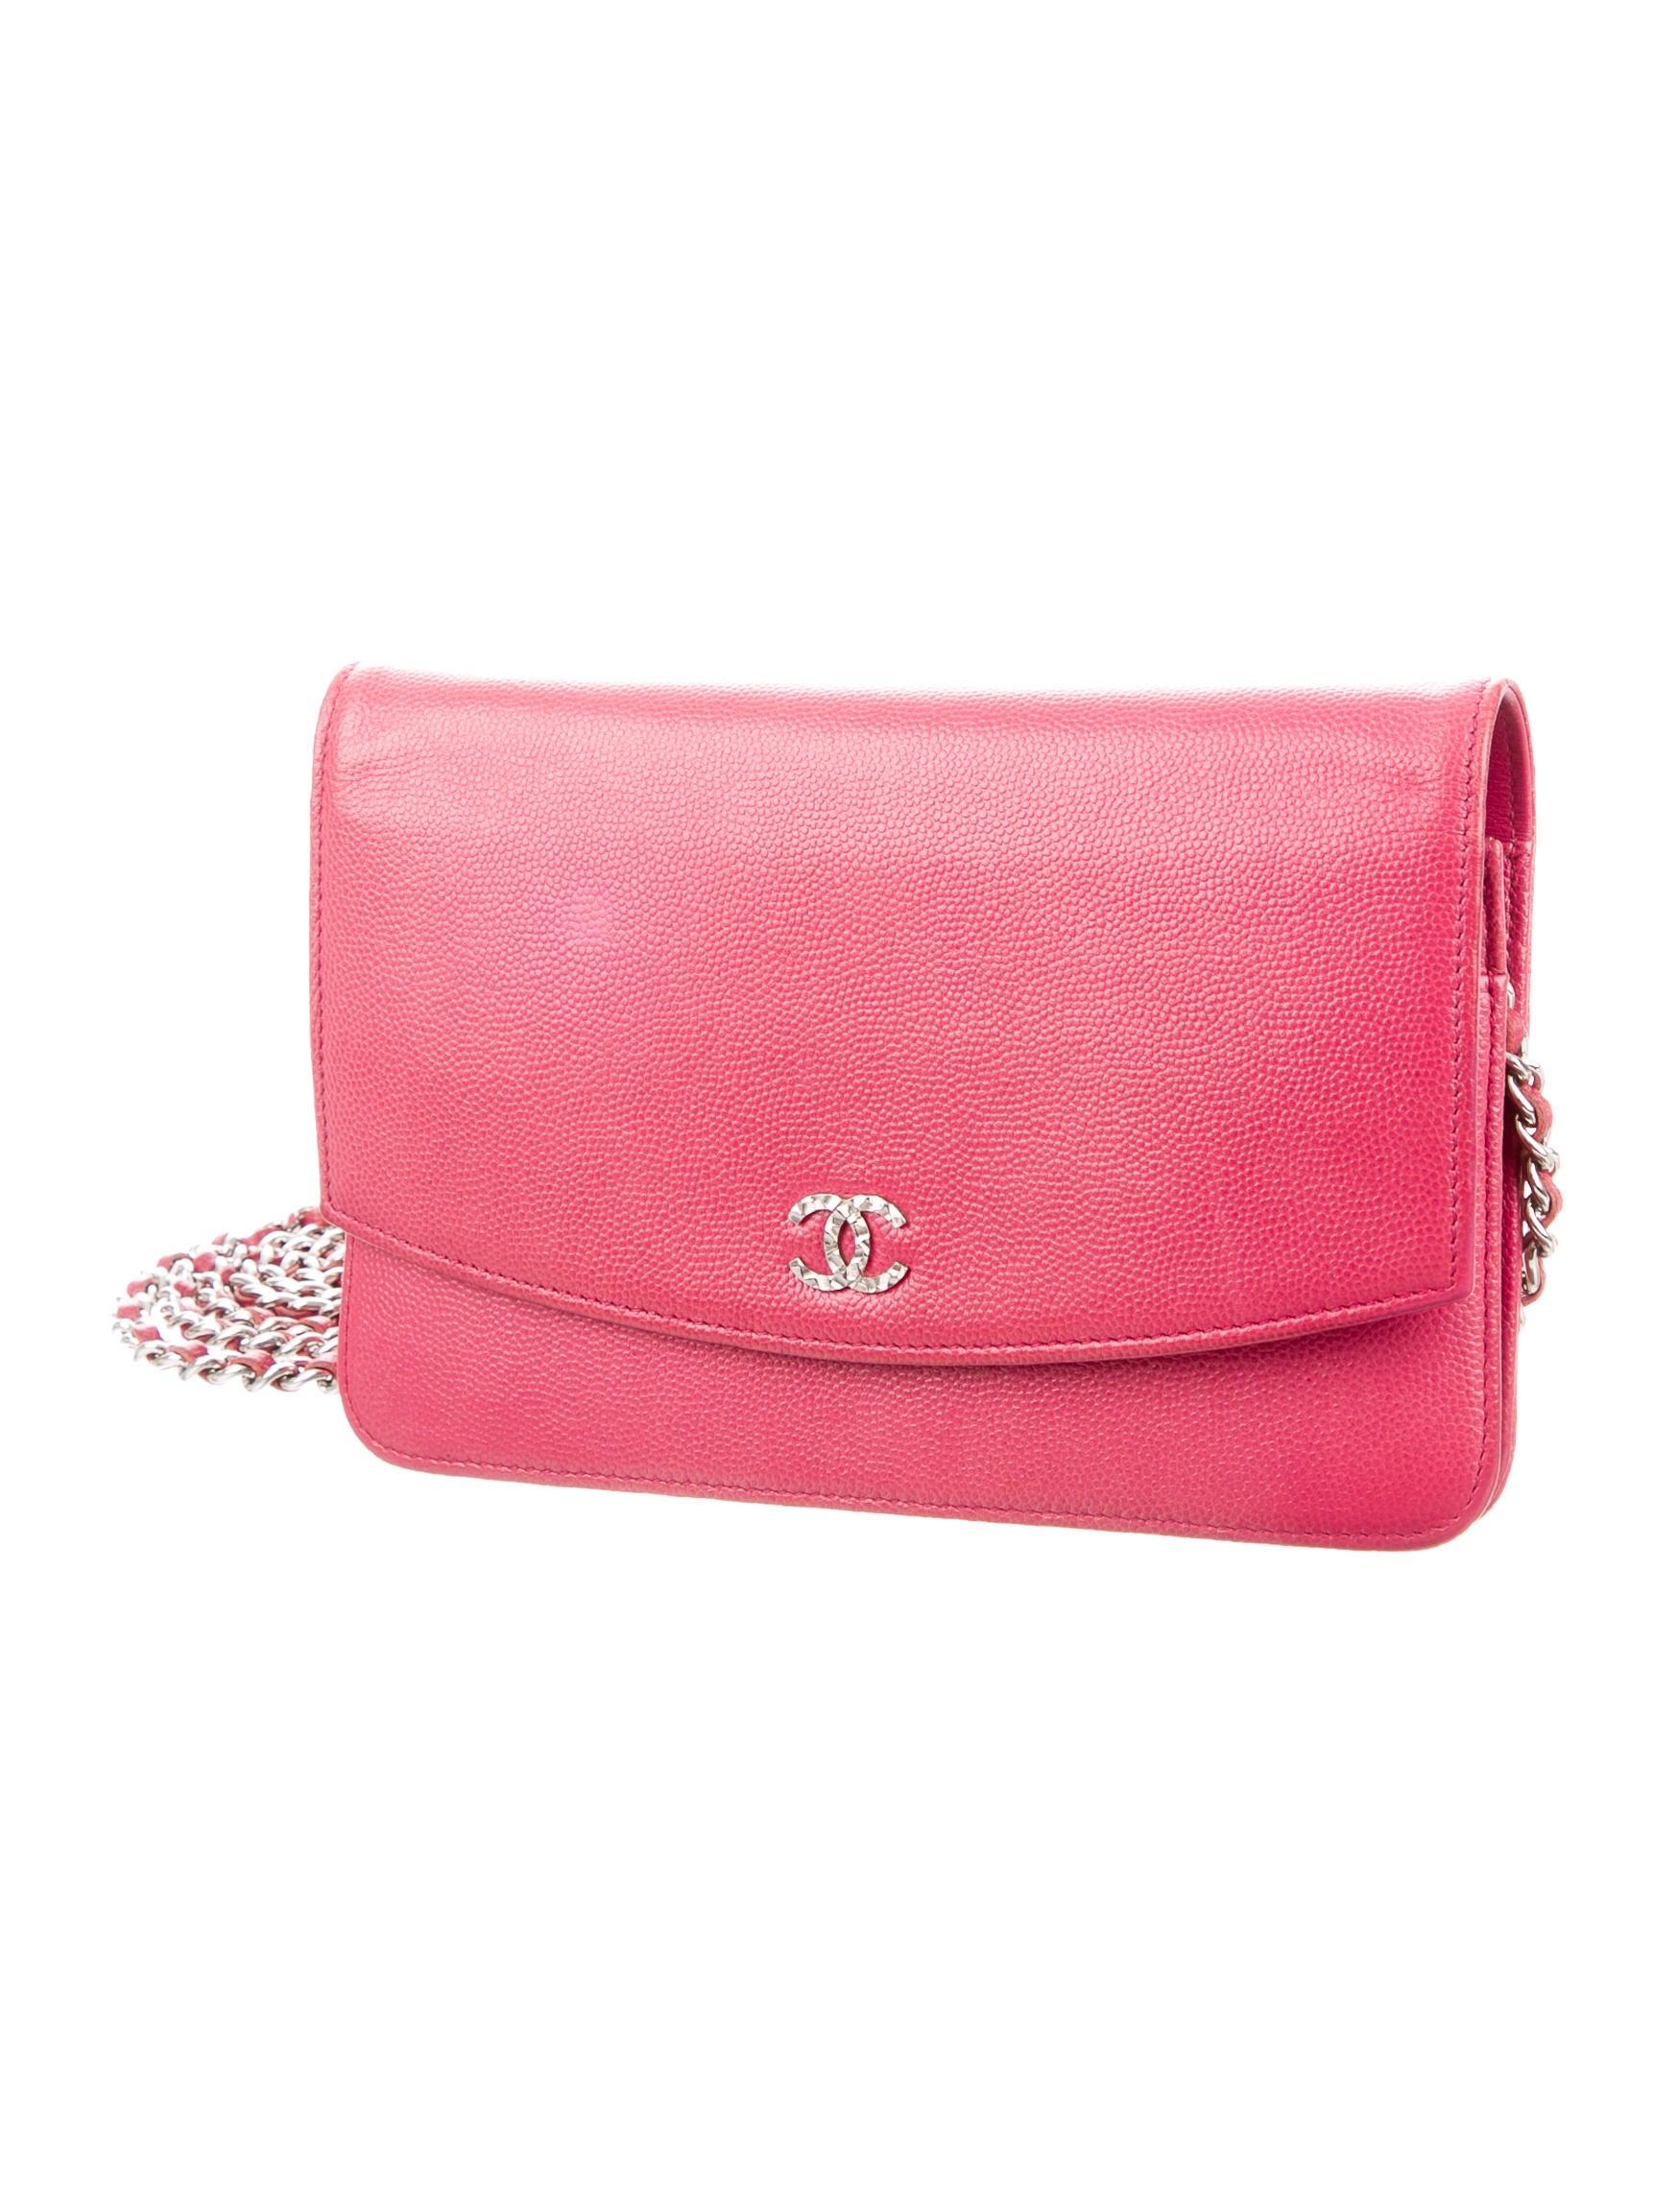 e647bdf22886 Chanel Caviar Sevruga Wallet On Chain - Handbags .